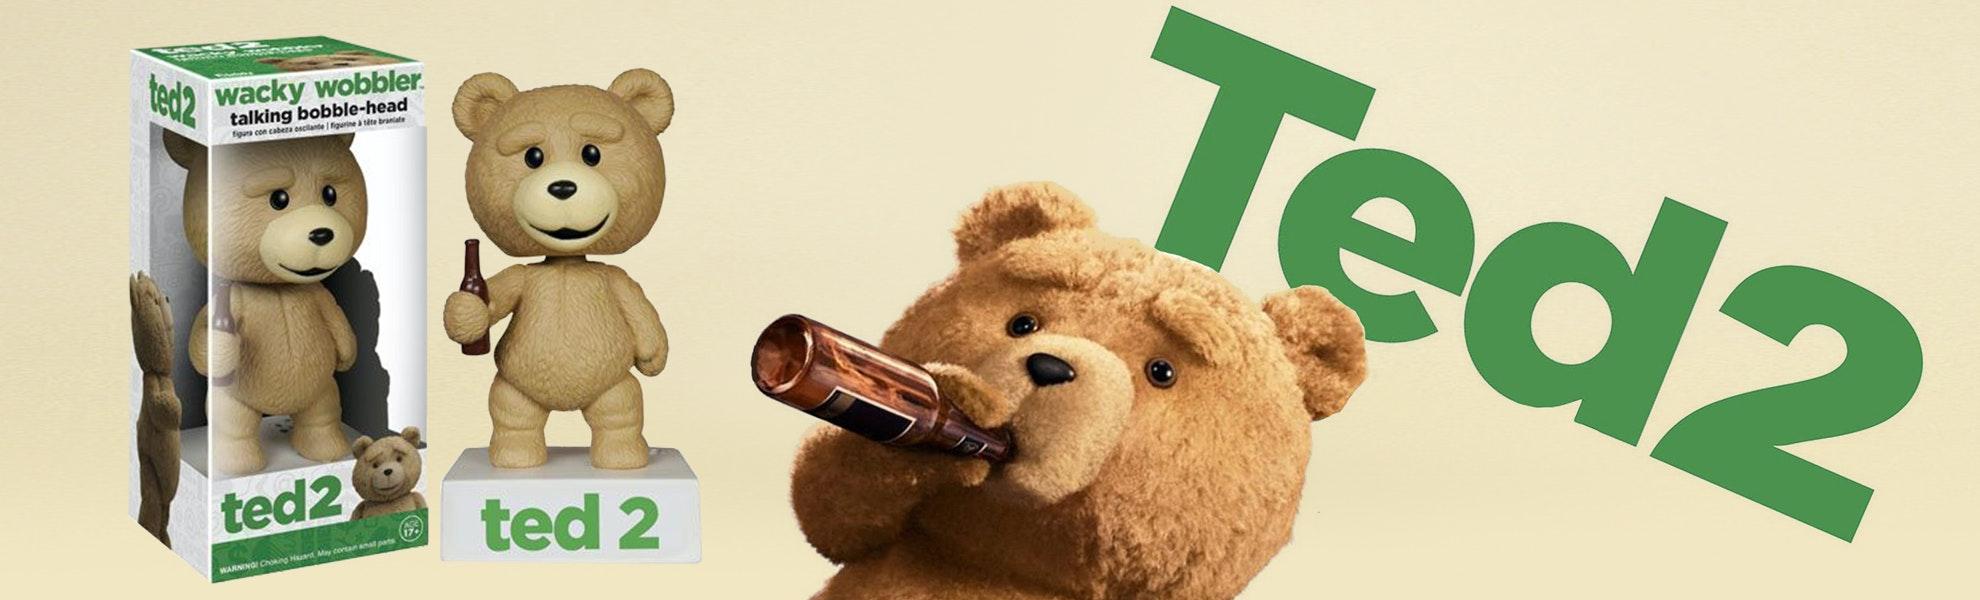 Talking Wackly Wobbler: Ted 2